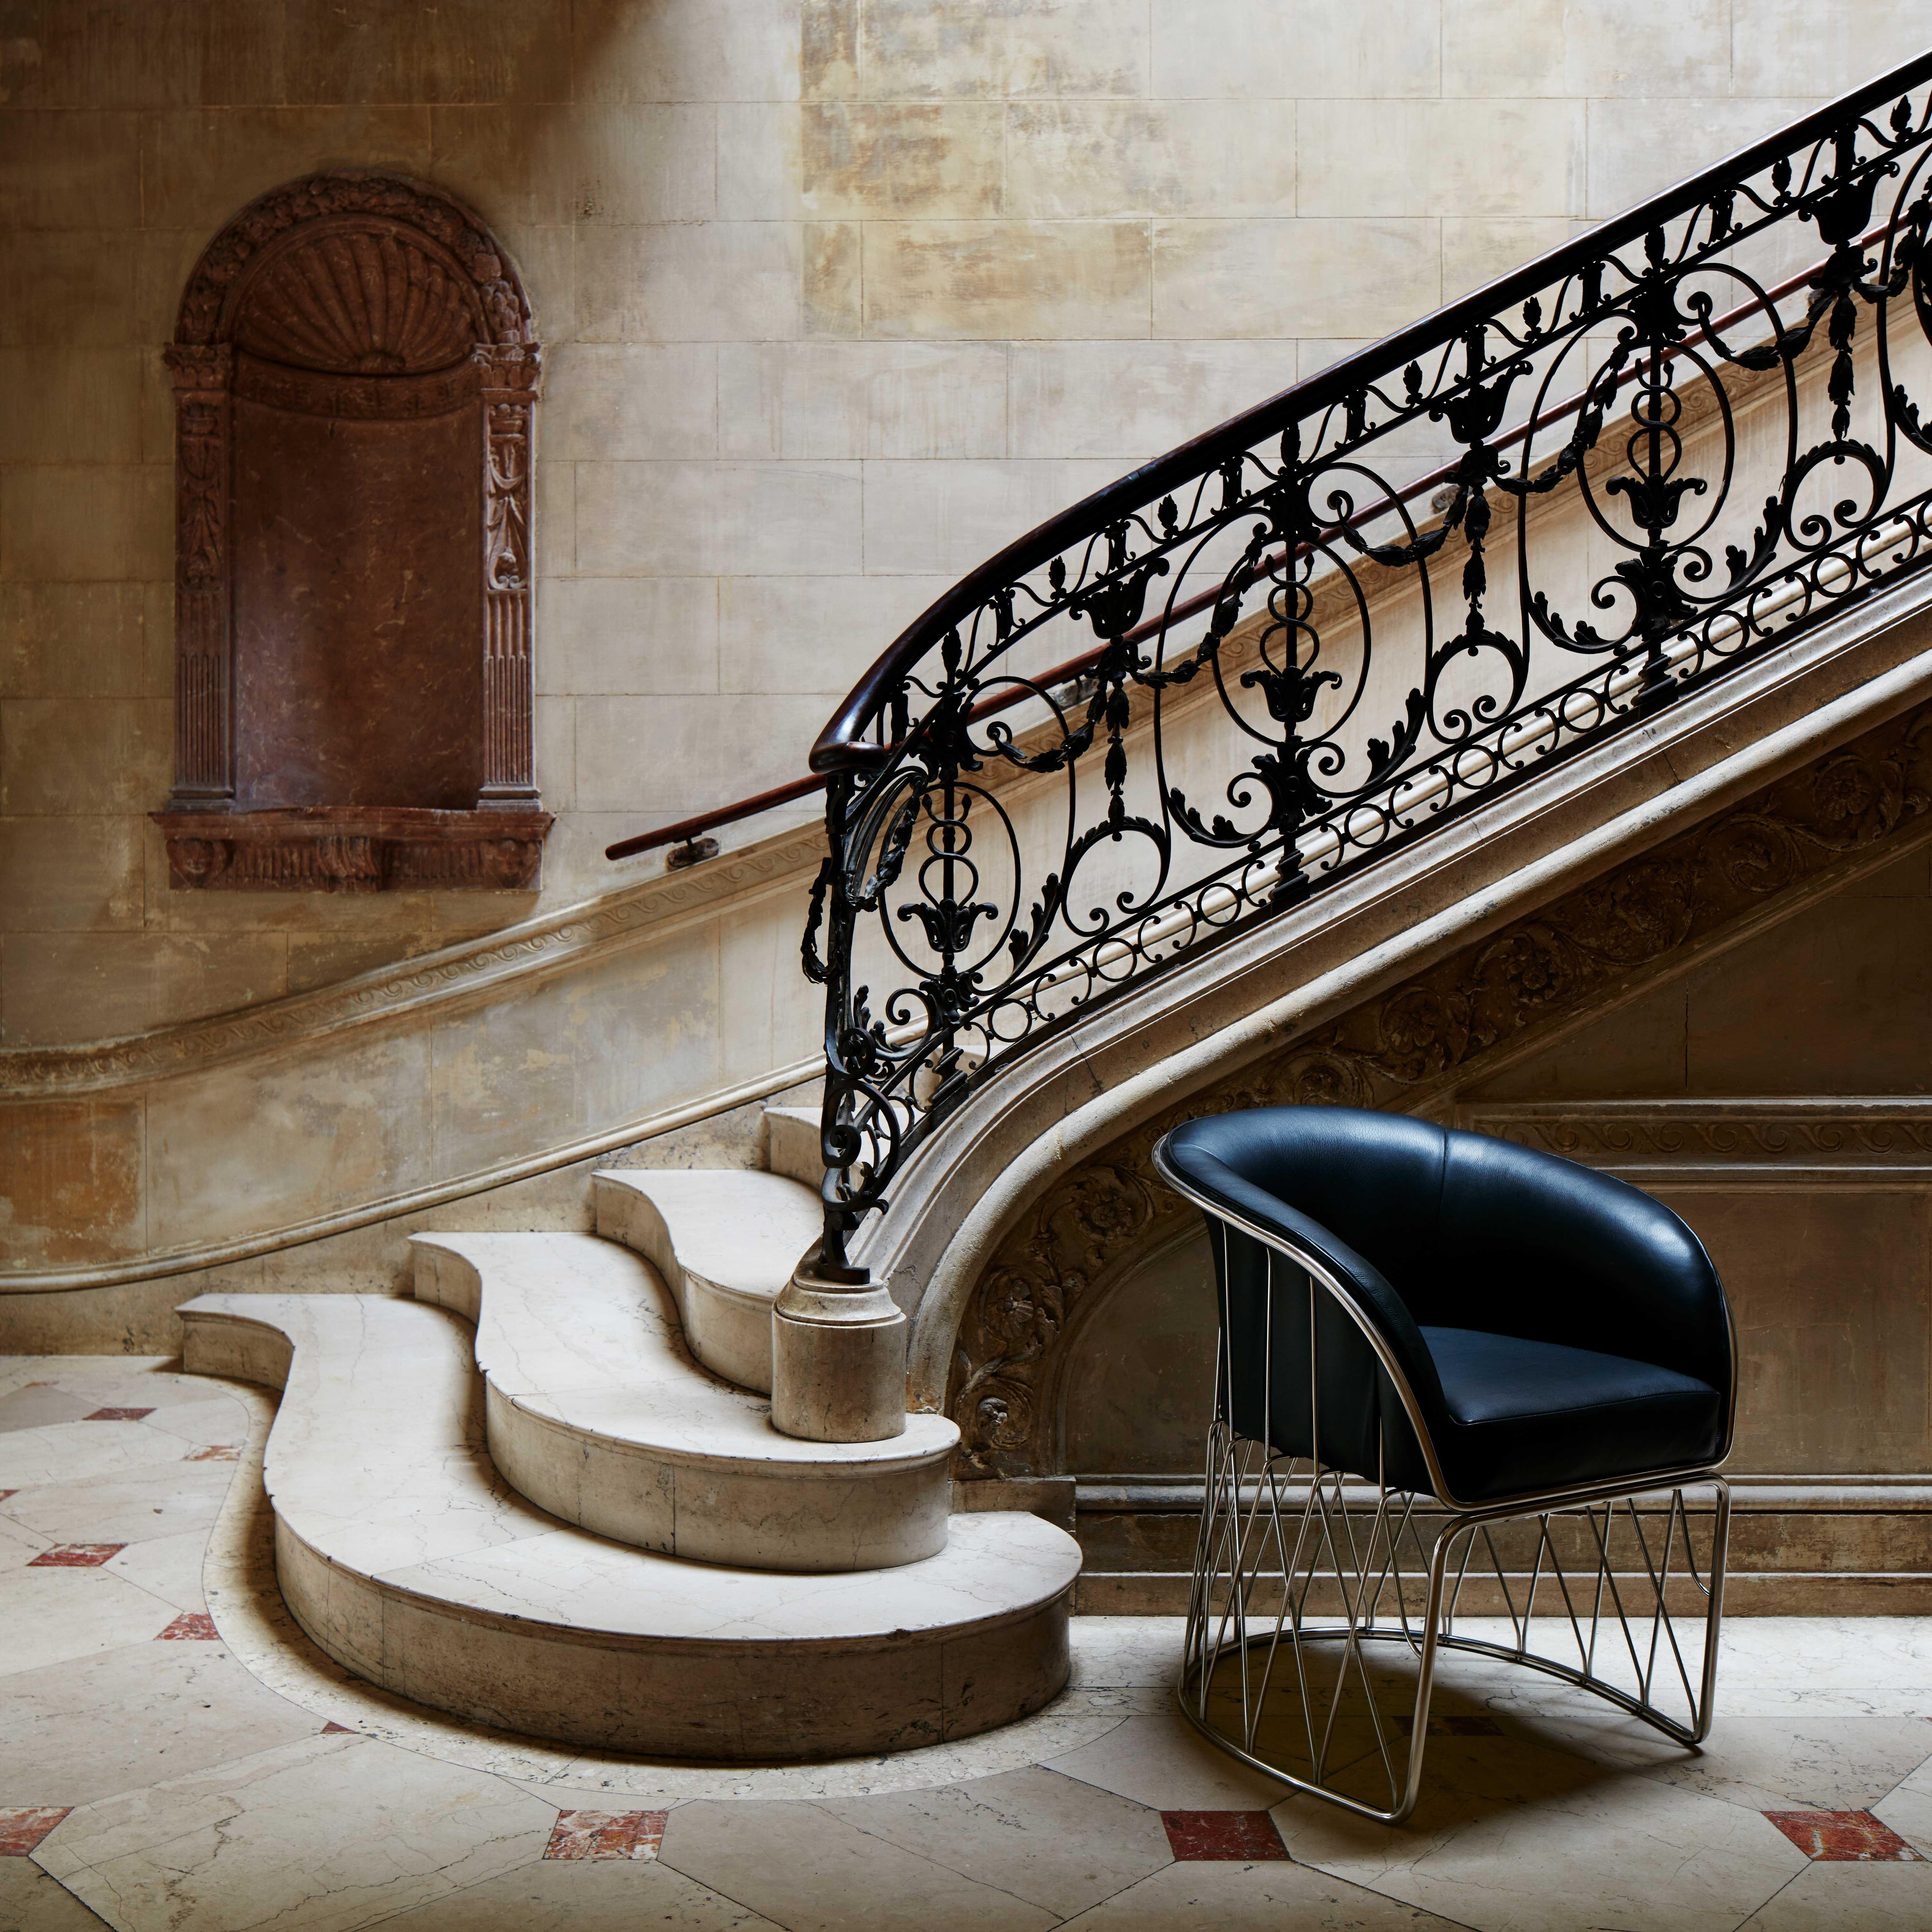 Equipal Chair By Pedro Ramirez Vazquez. #pedroramirezvazquez #modern # Mexican #furniture #